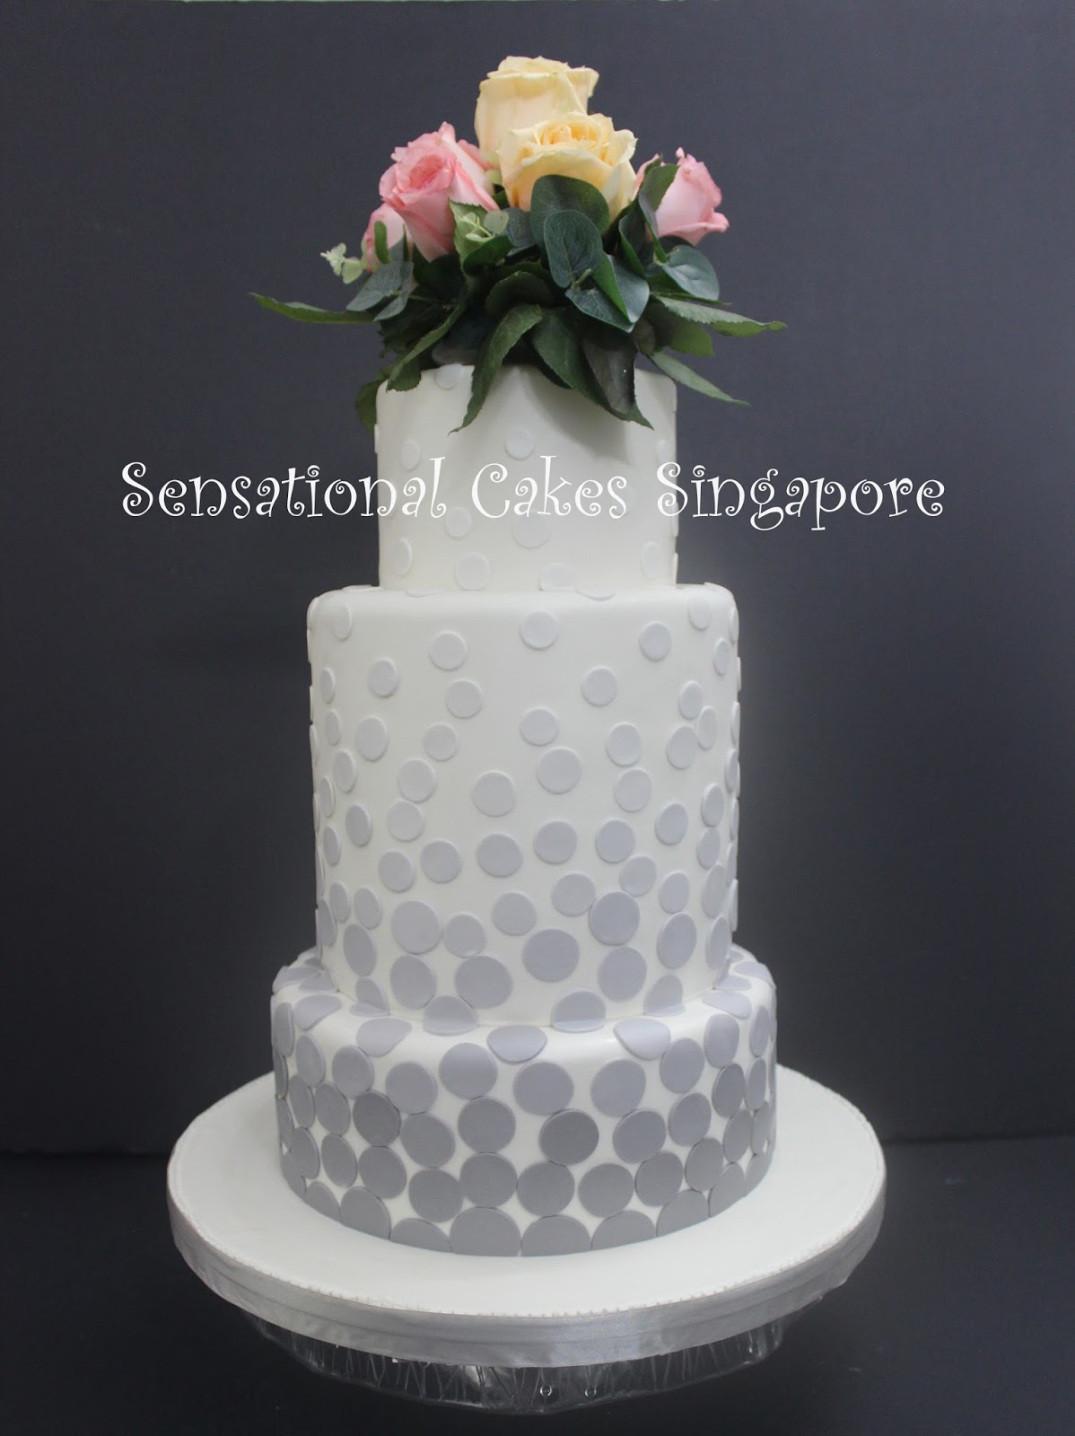 Wedding Cakes Sg  WEDDING CAKE – Sensational Cakes Singapore